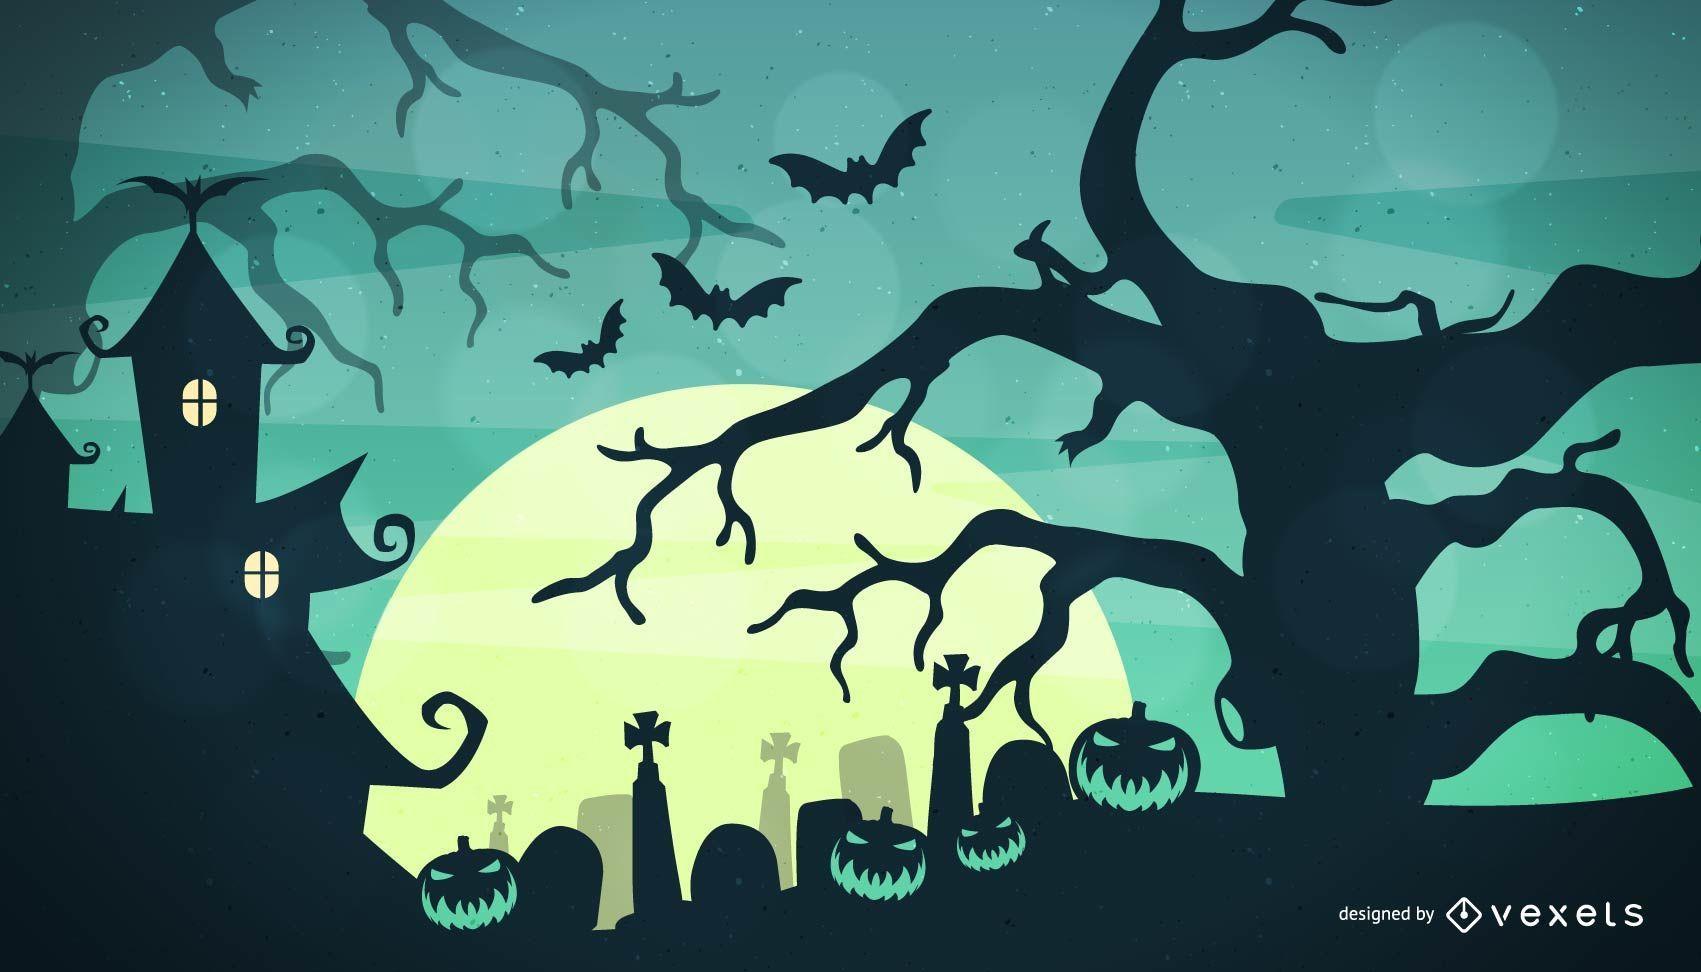 Spooky Halloween Night Background